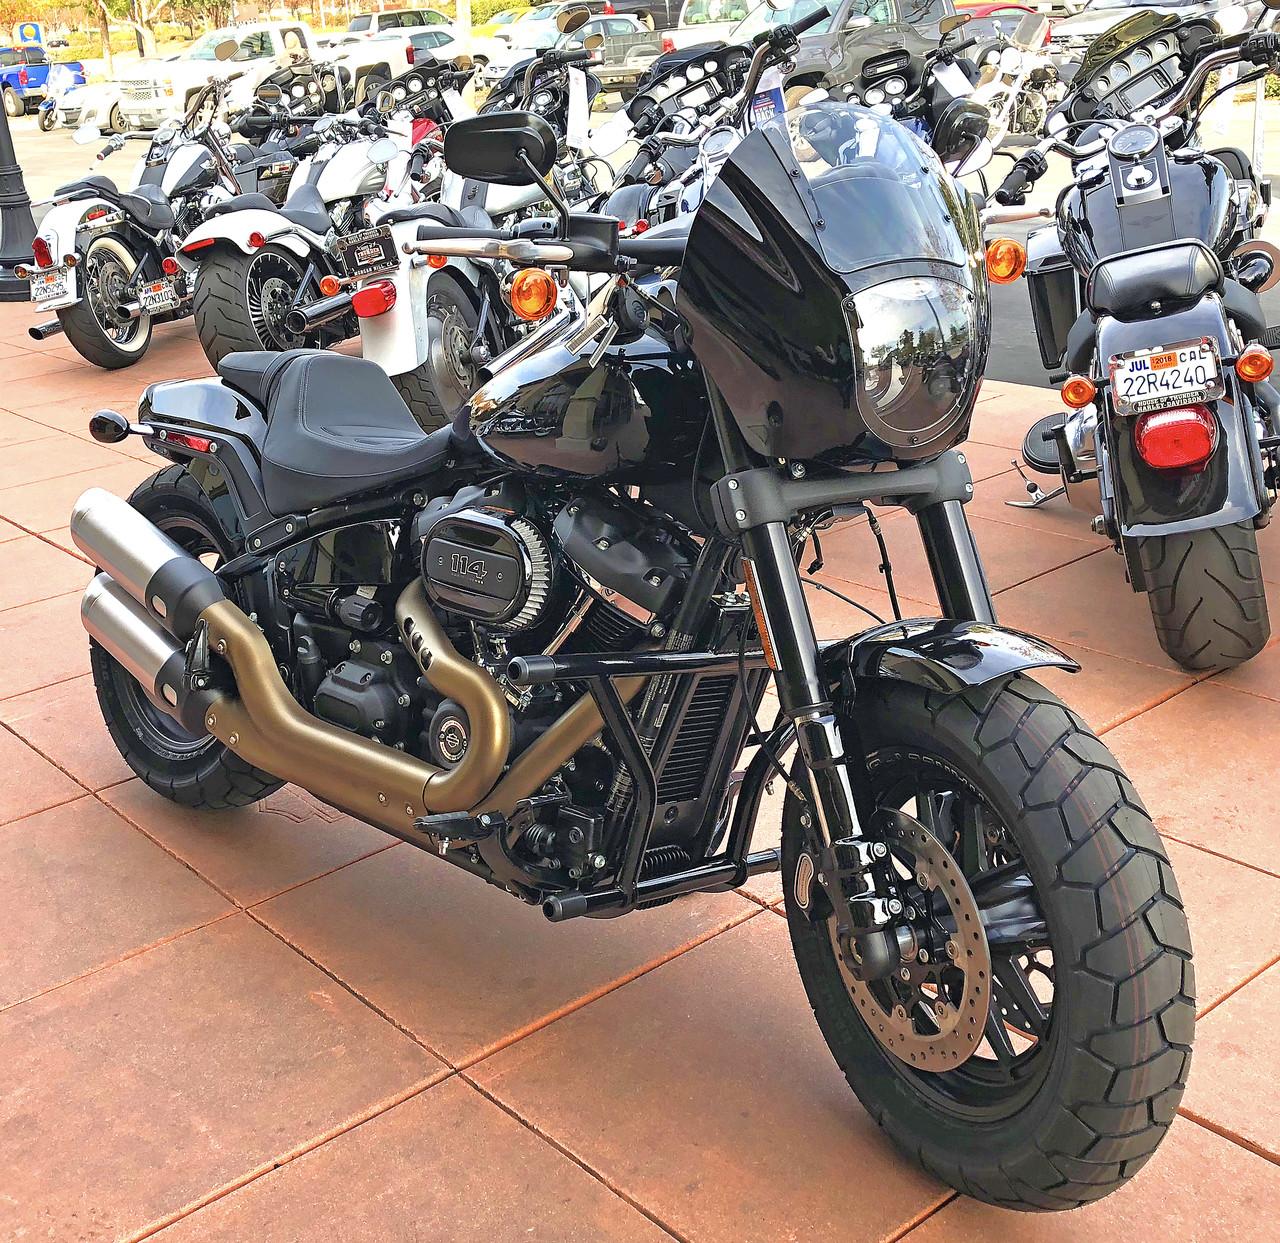 Harley Quarter Fairing To 49mm 2018 Softail Street Bob Low Rider